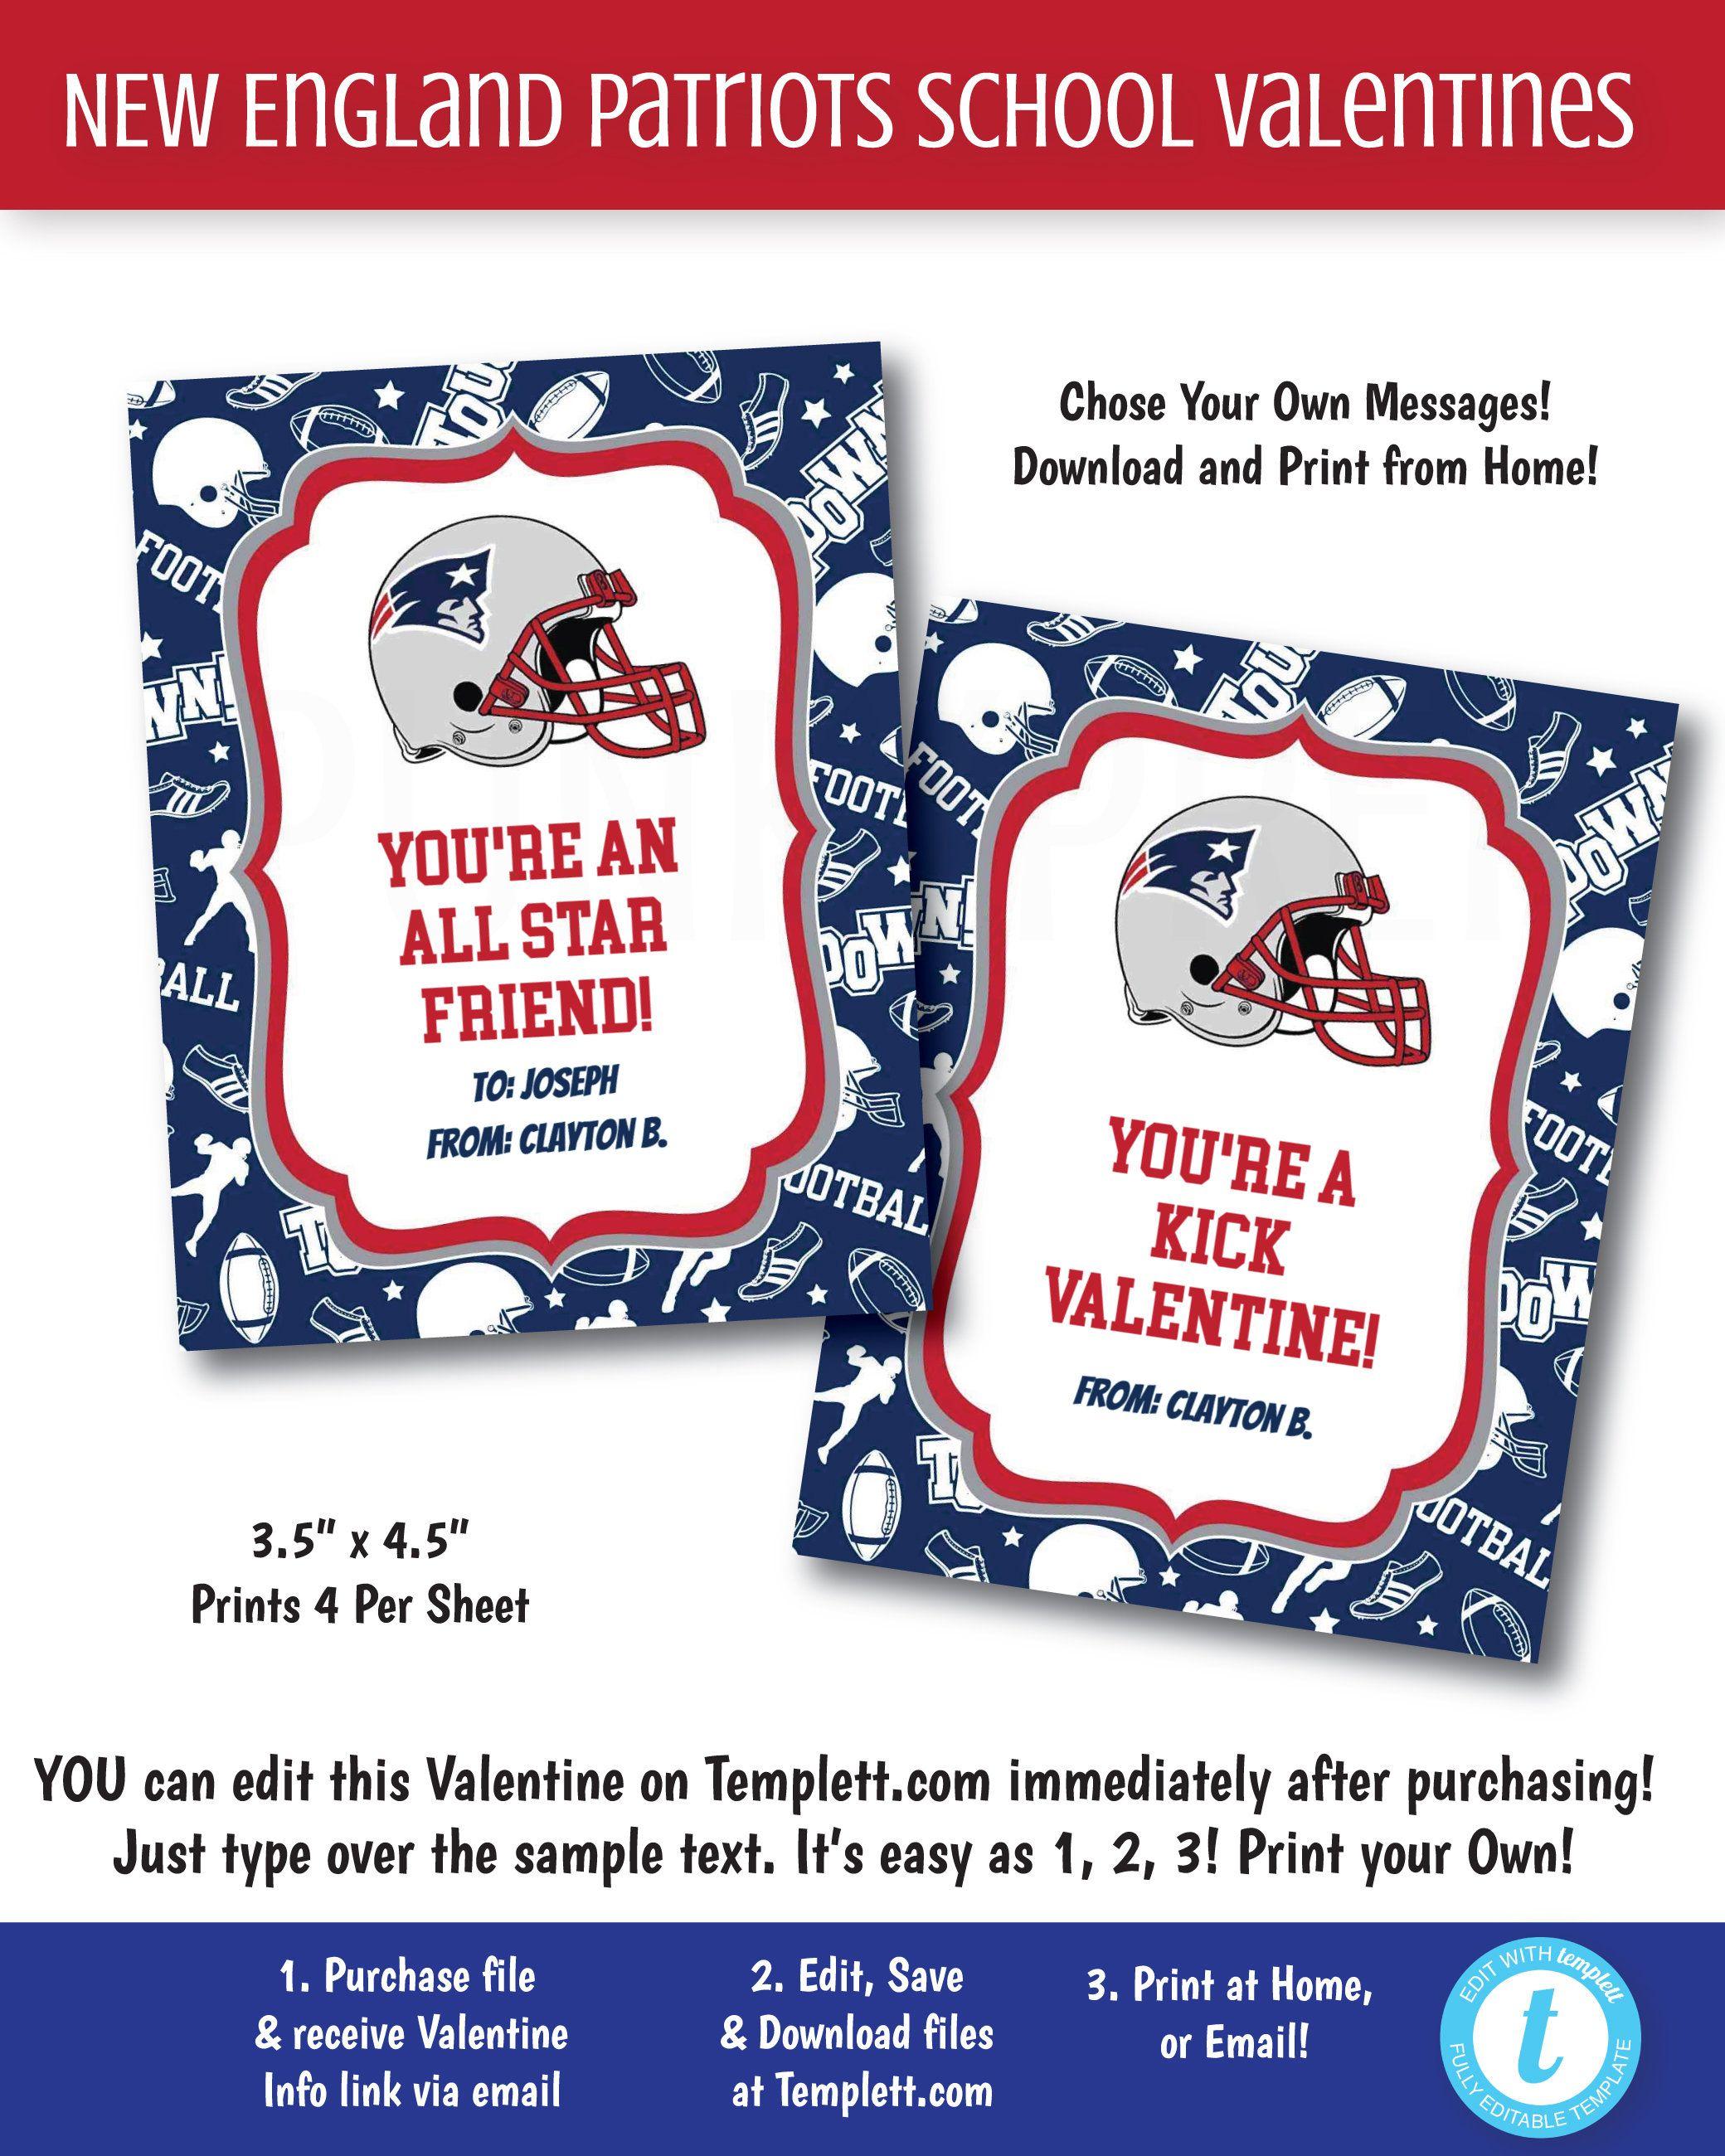 New England Patriots Valentines Printable Football School Valentines Boys Patriots Valentines Kids In 2020 Valentines School Valentines For Boys Valentines For Kids